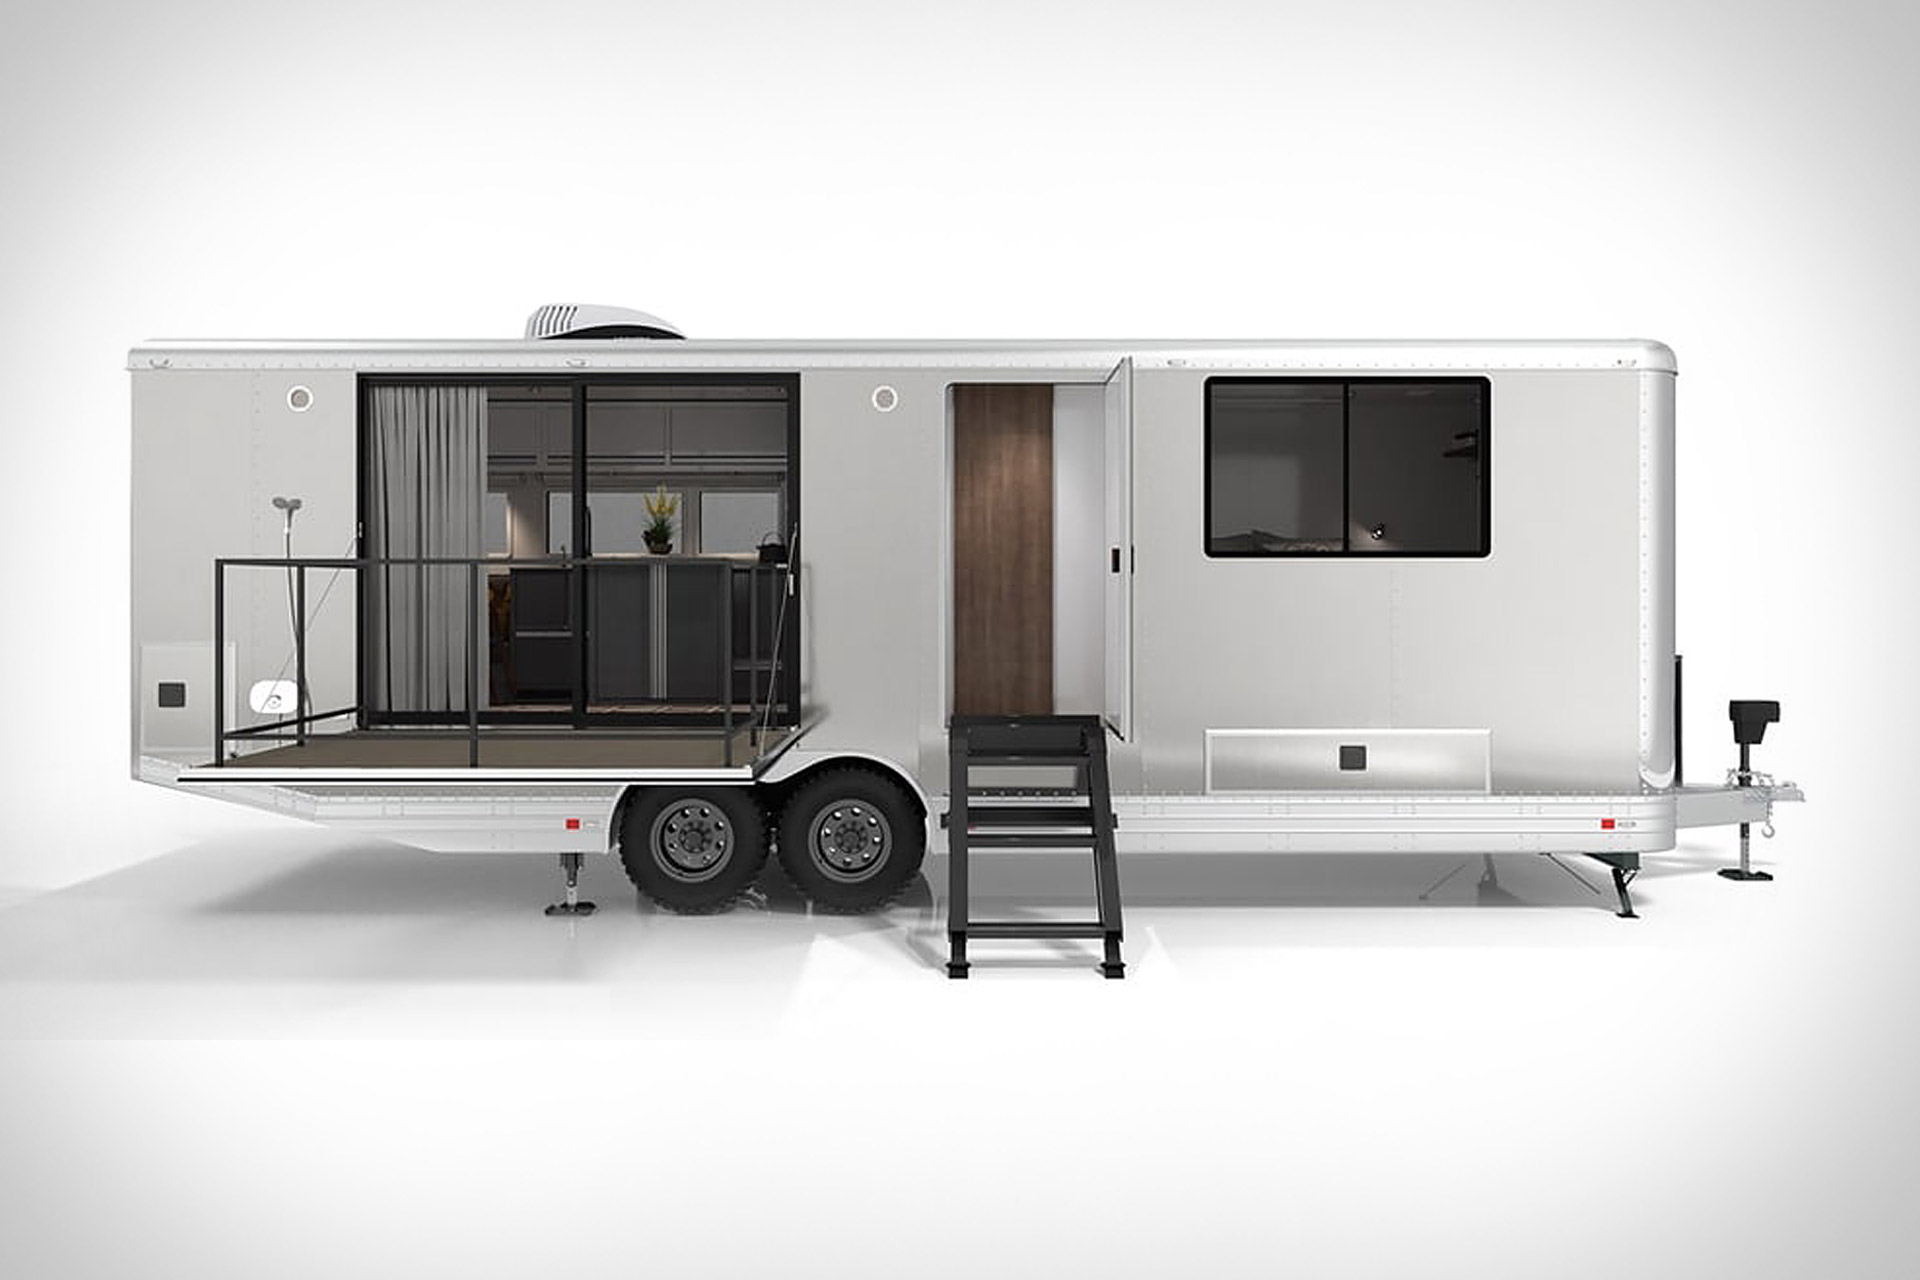 2021 Living Vehicle Core Trailer